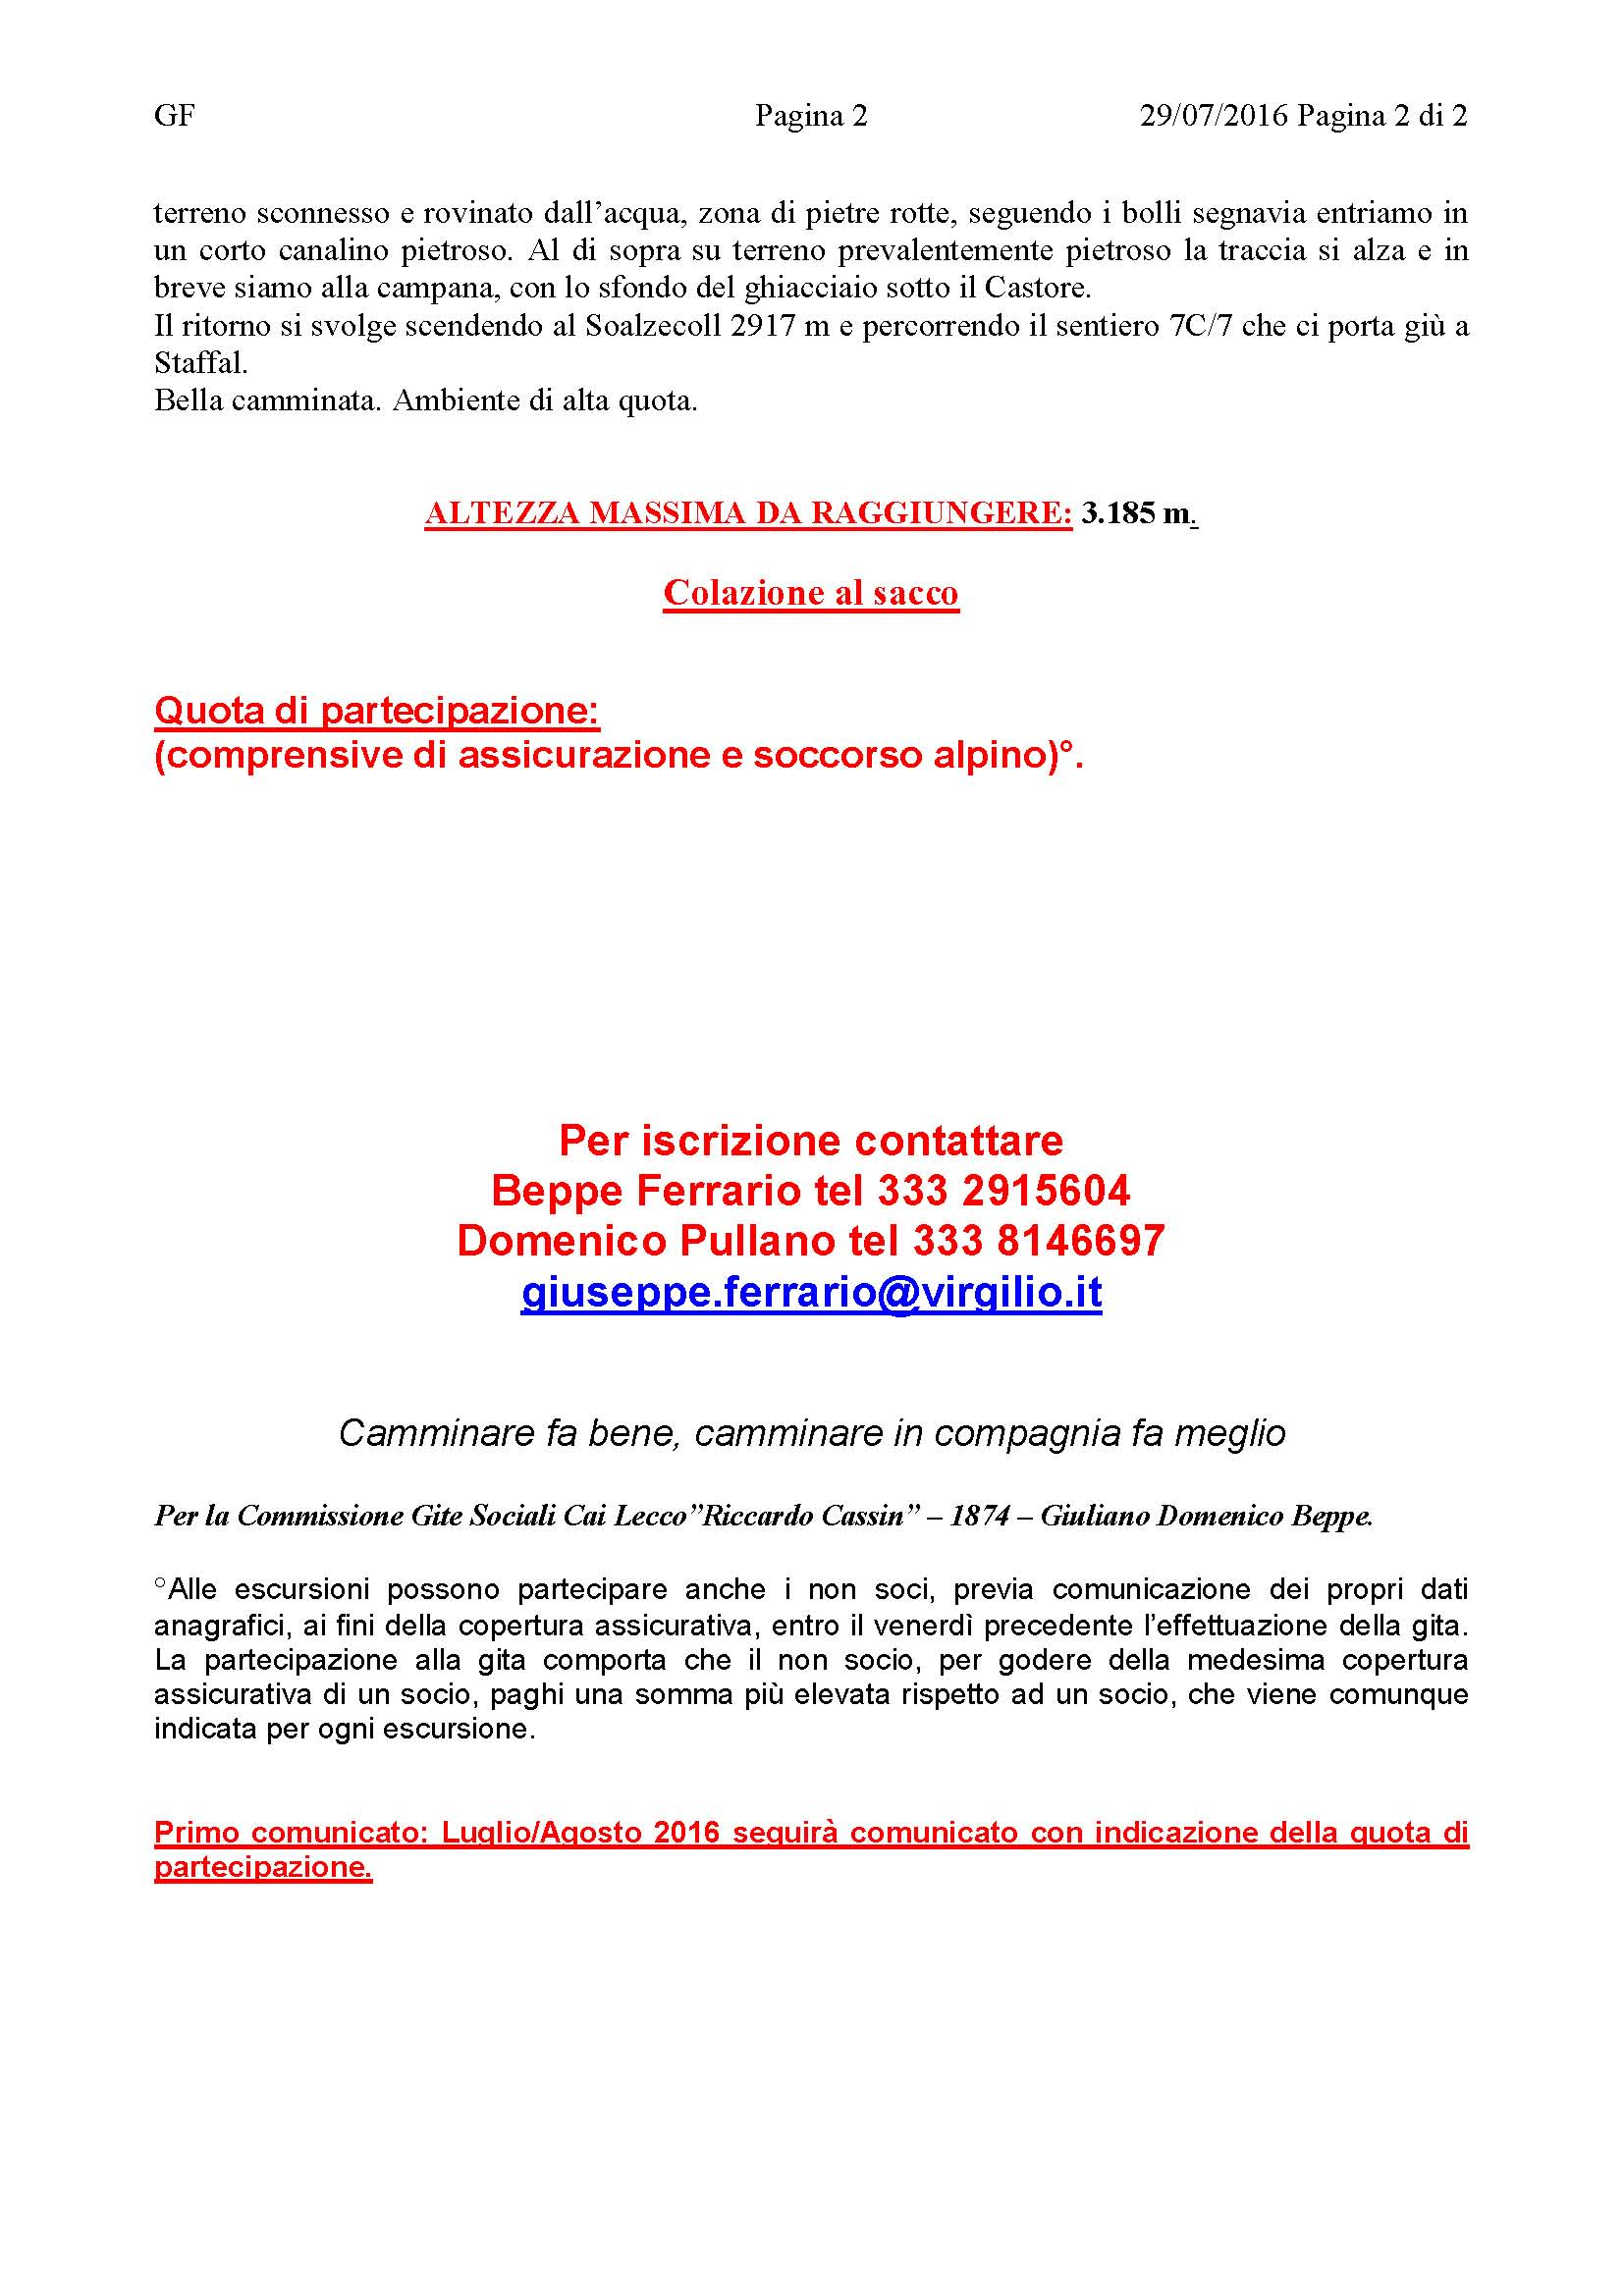 gita 1109_Pagina_2